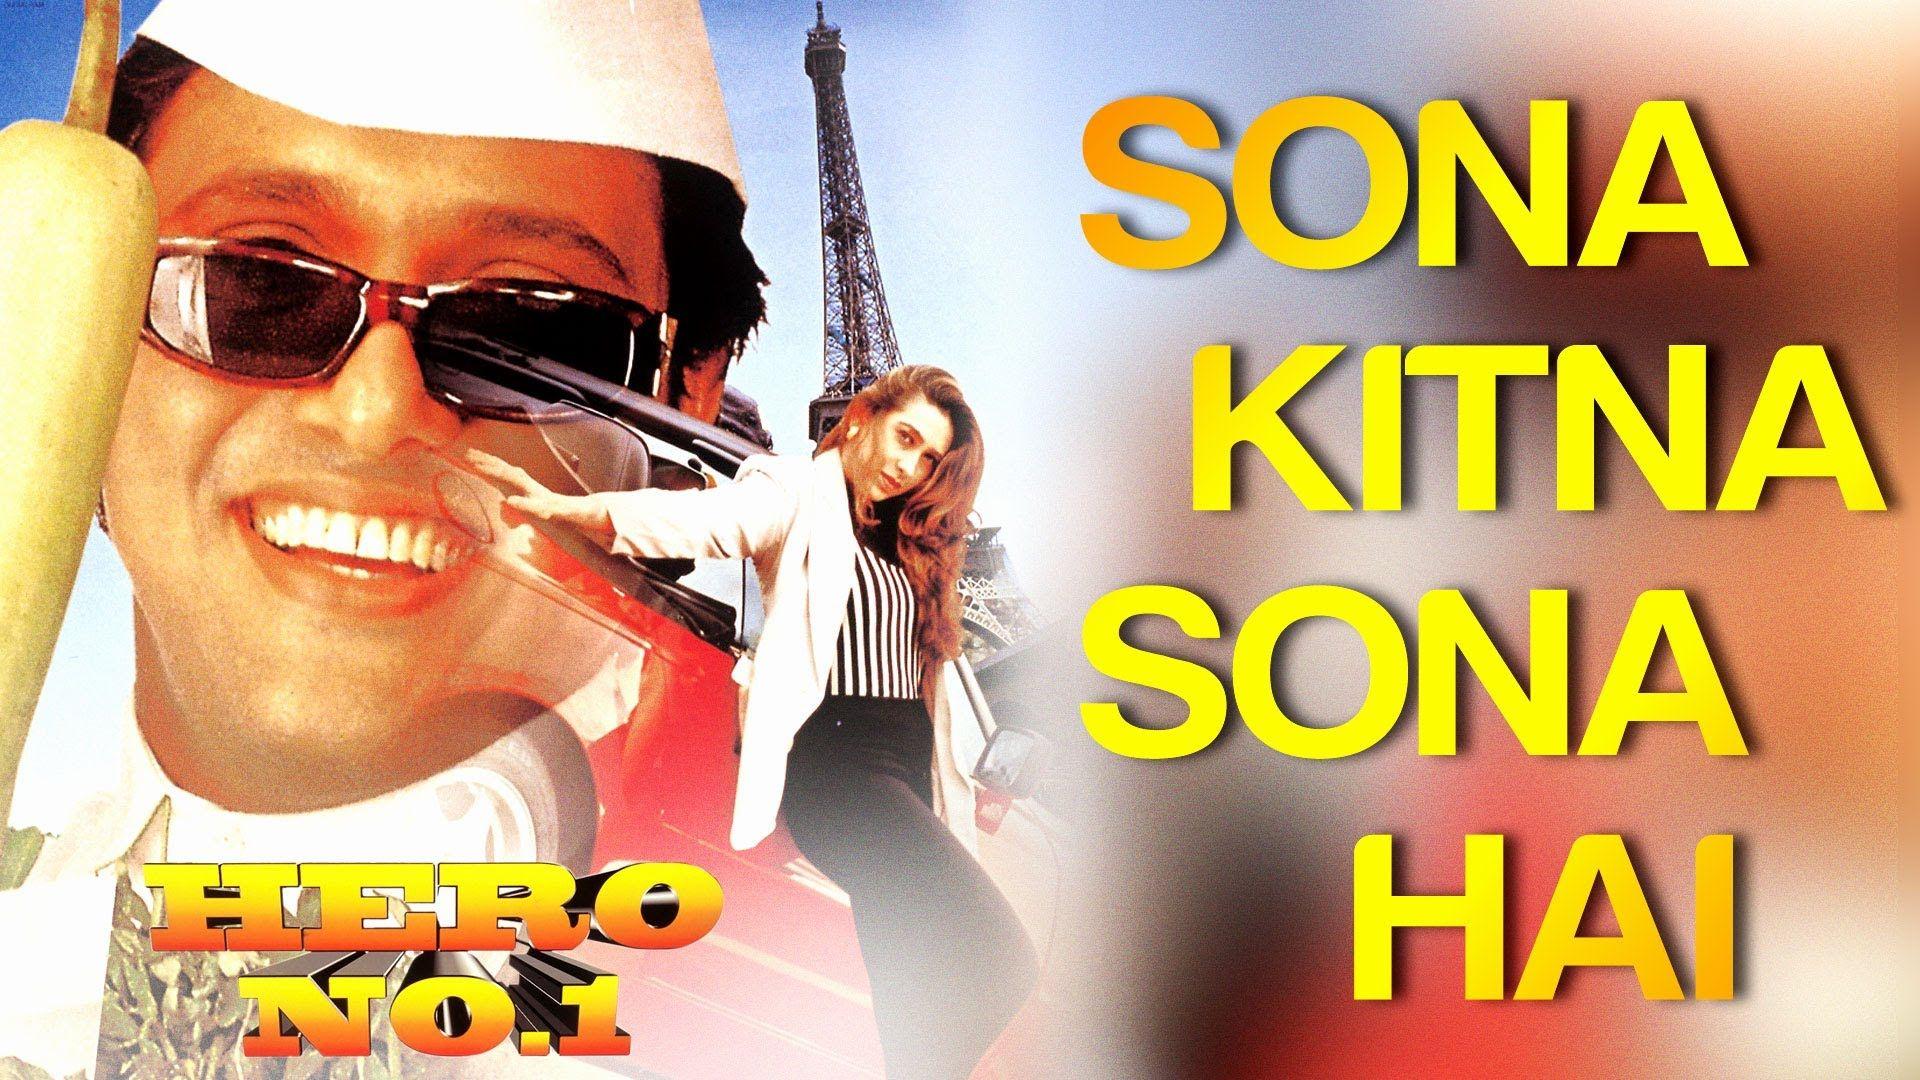 Sona Kitna Sona Hai Hero No 1 Govinda Karisma Kapoor Udit Naray Omg Latest Bollywood Songs Hindi Movie Song Indian Movie Songs